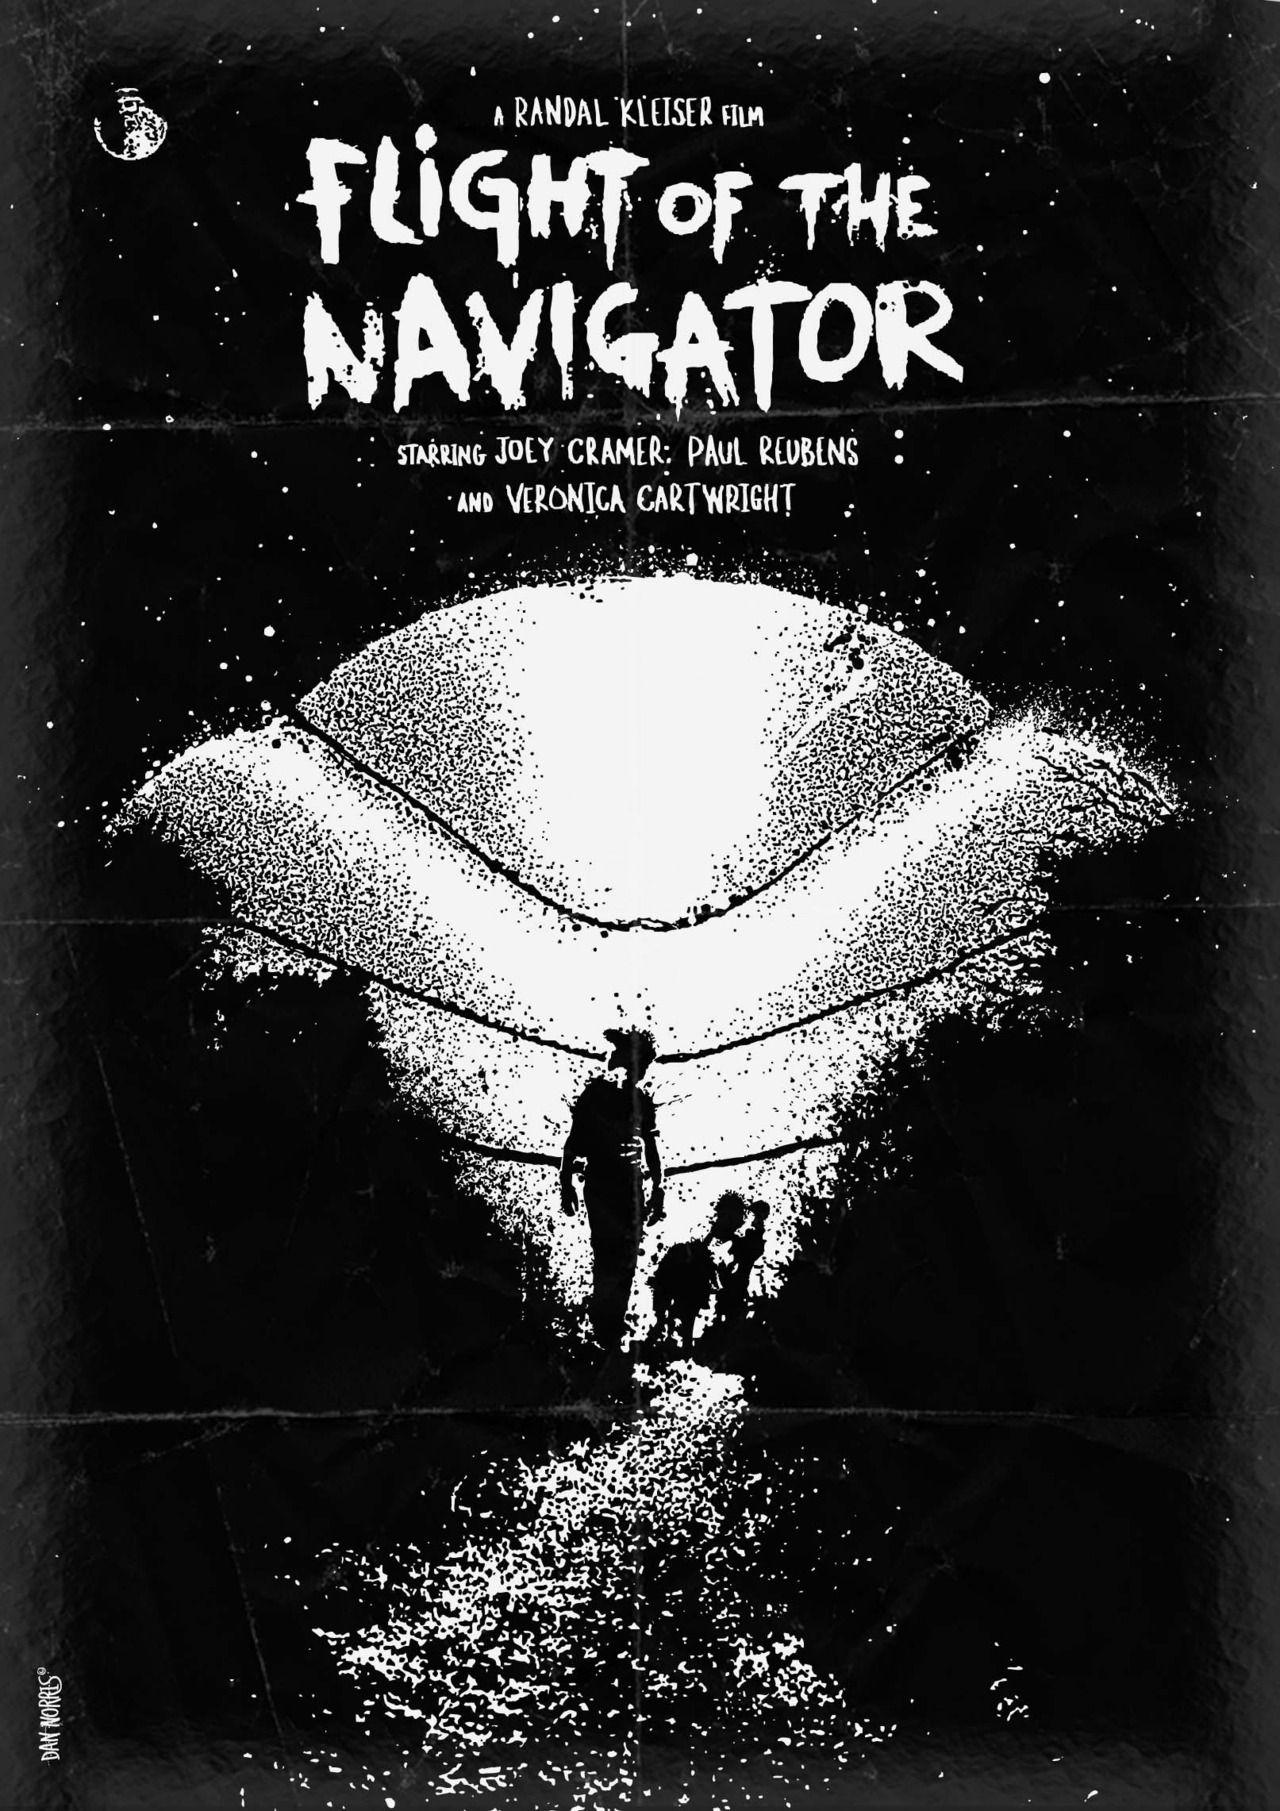 Flight Of The Navigator 1986 Minimal Movie Poster By Daniel Norris Amusementphile Flight Of The Navigator Movie Posters Horror Prints